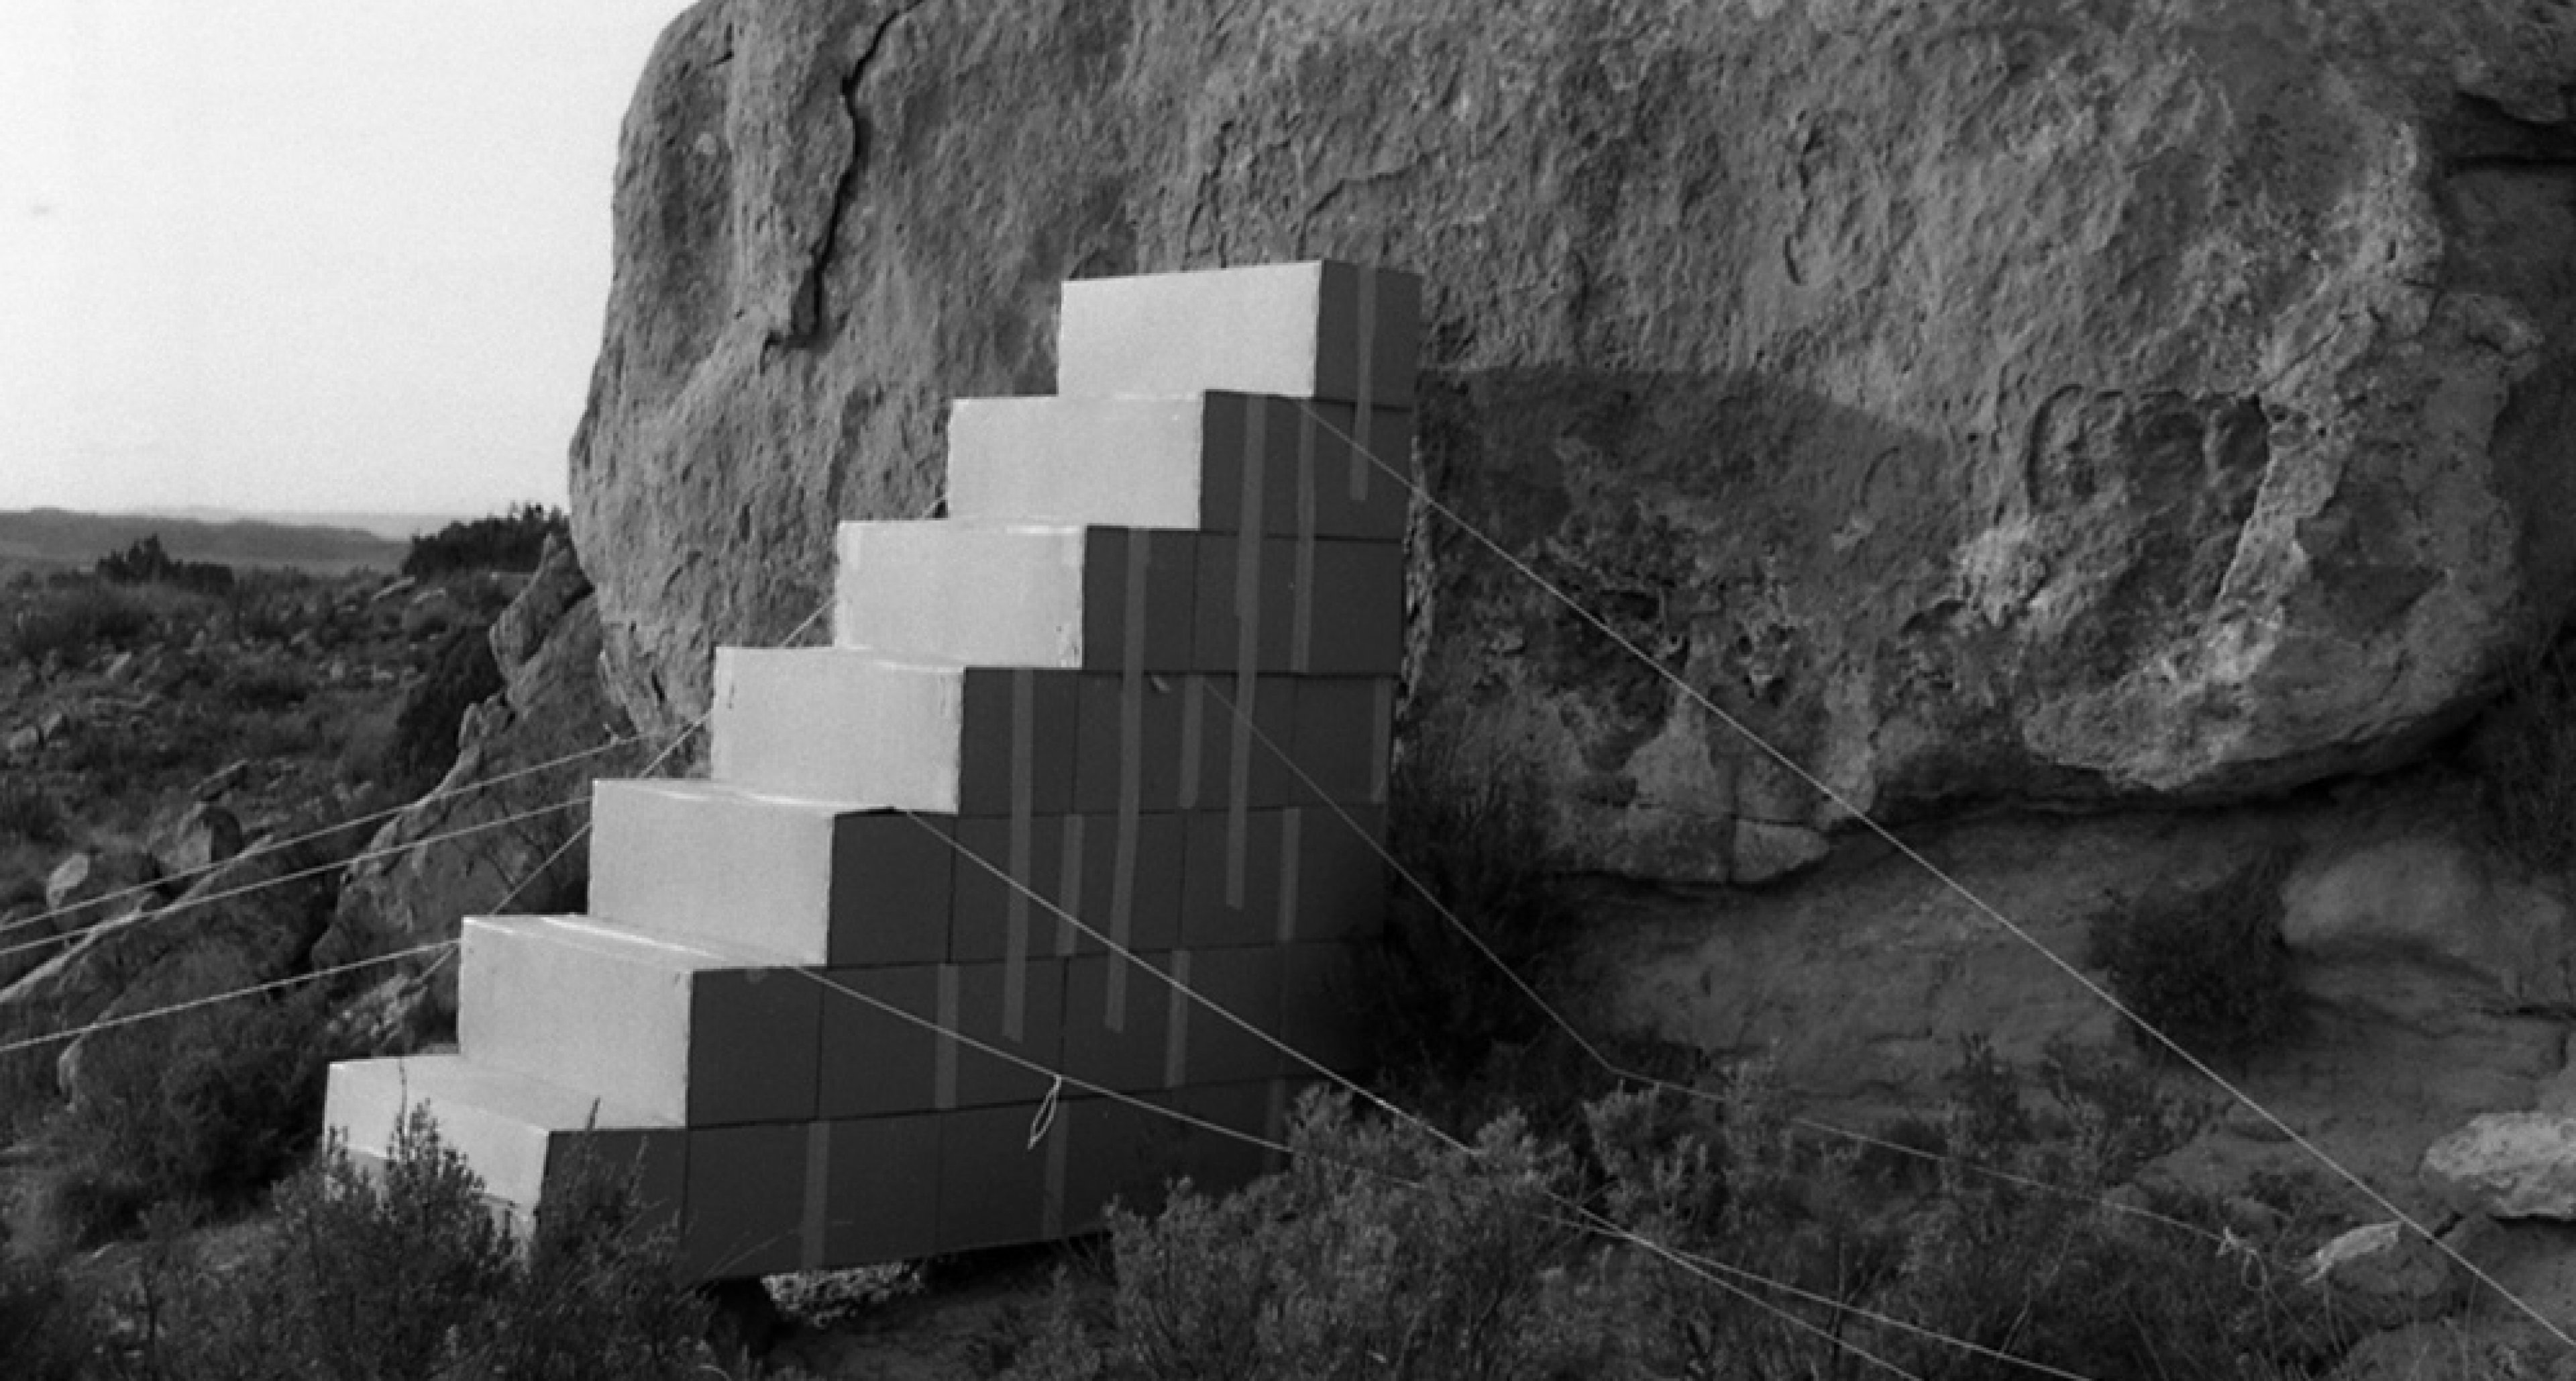 »Metafore«, Balaguer, 1974. Photo by Ettore Sottsass, Courtesy of Studio Ettore Sottsass